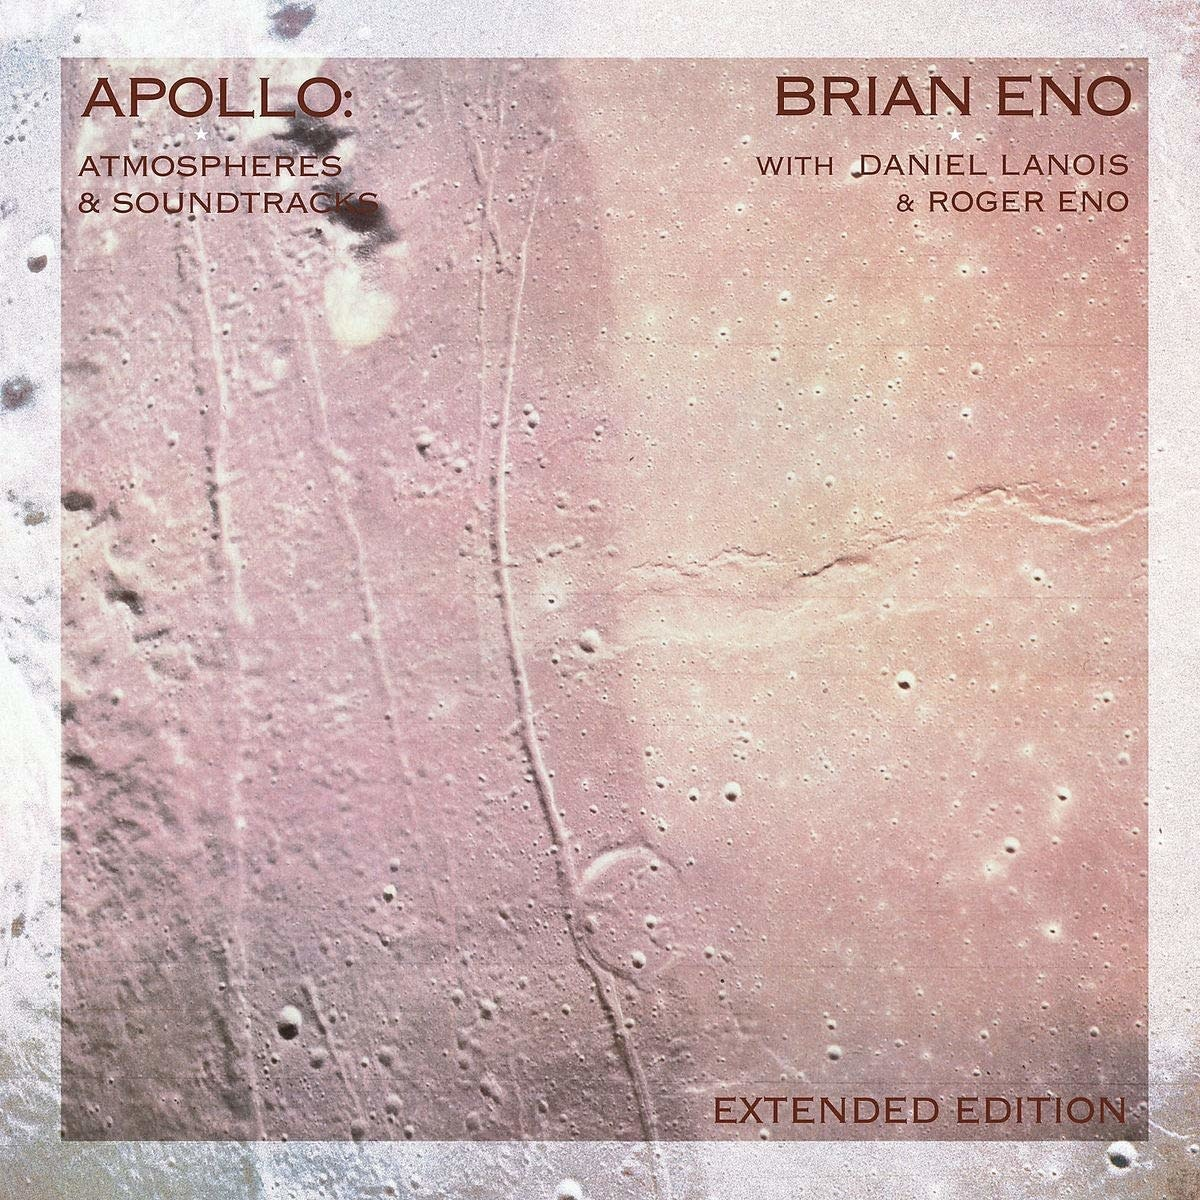 Brian Eno - Apollo: Atmospheres & Soundtracks Extended Edition